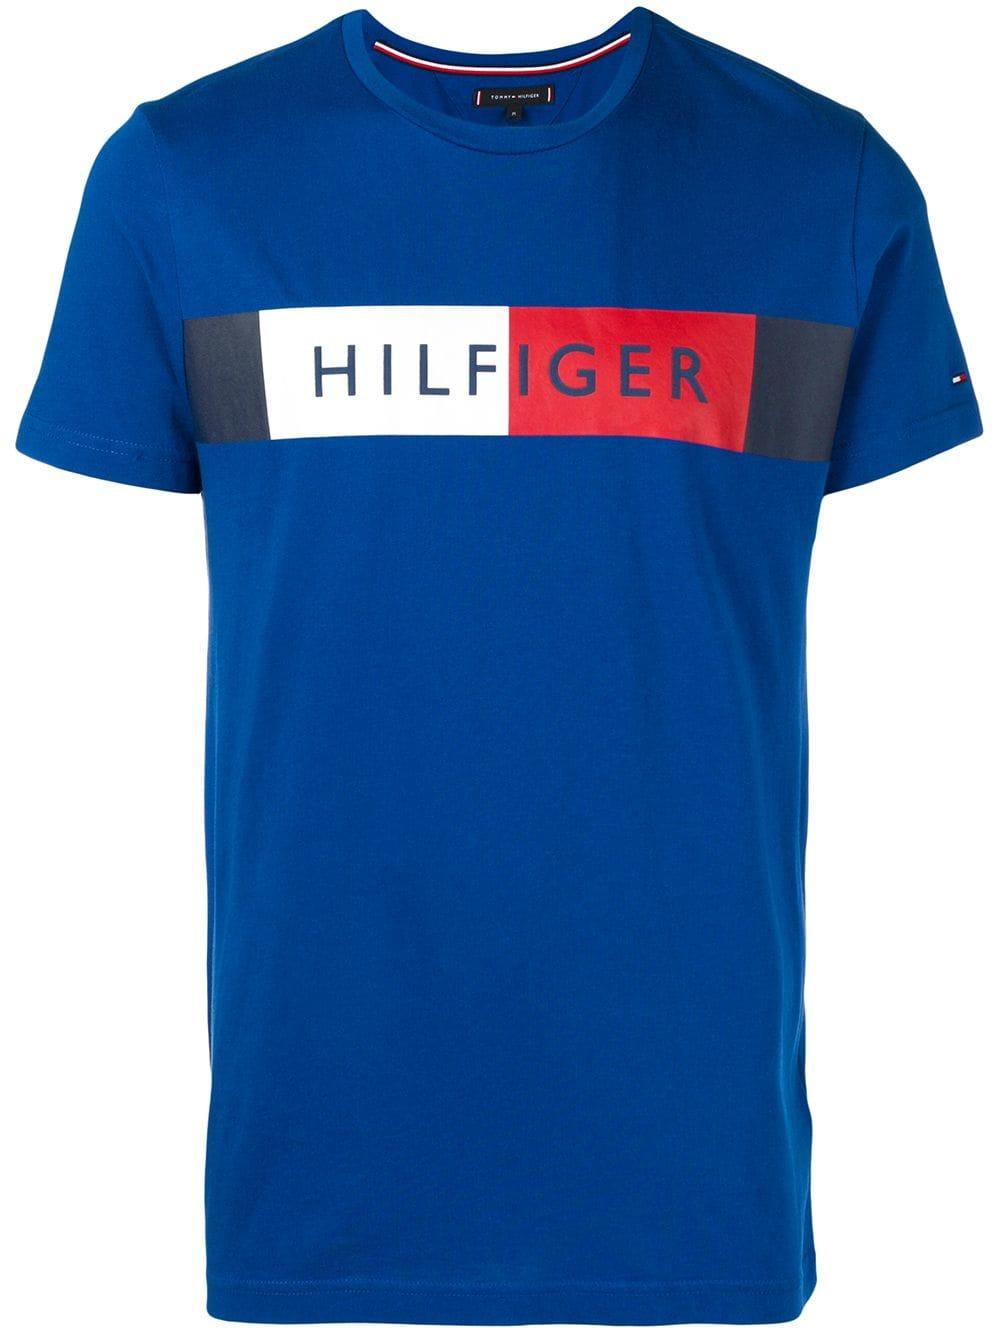 TOMMY HILFIGER T Shirt blau